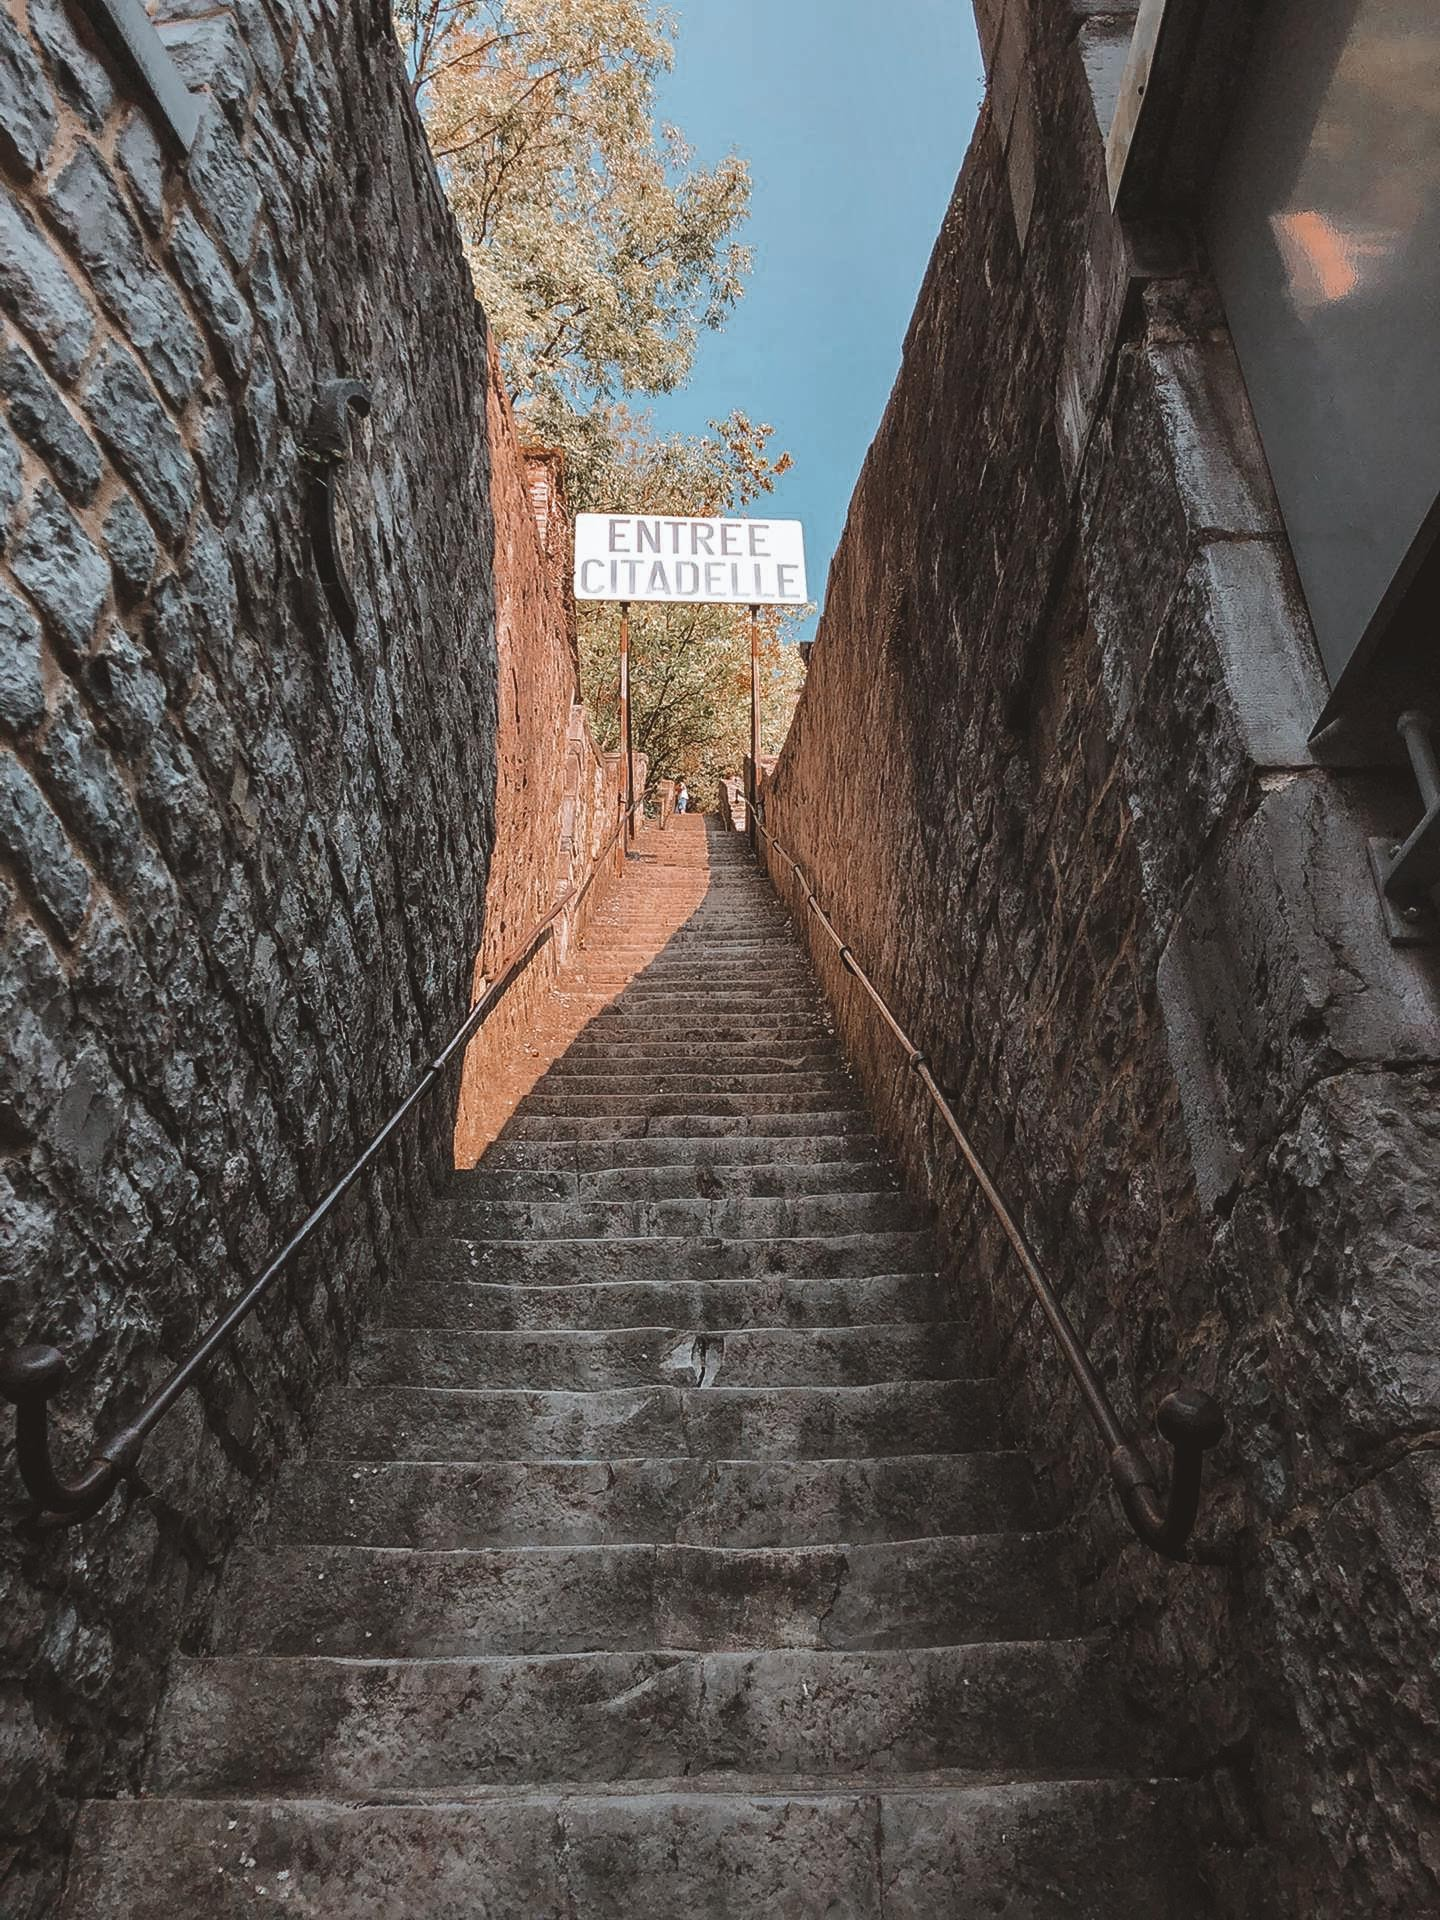 Steps to the Citadelle de Dinant